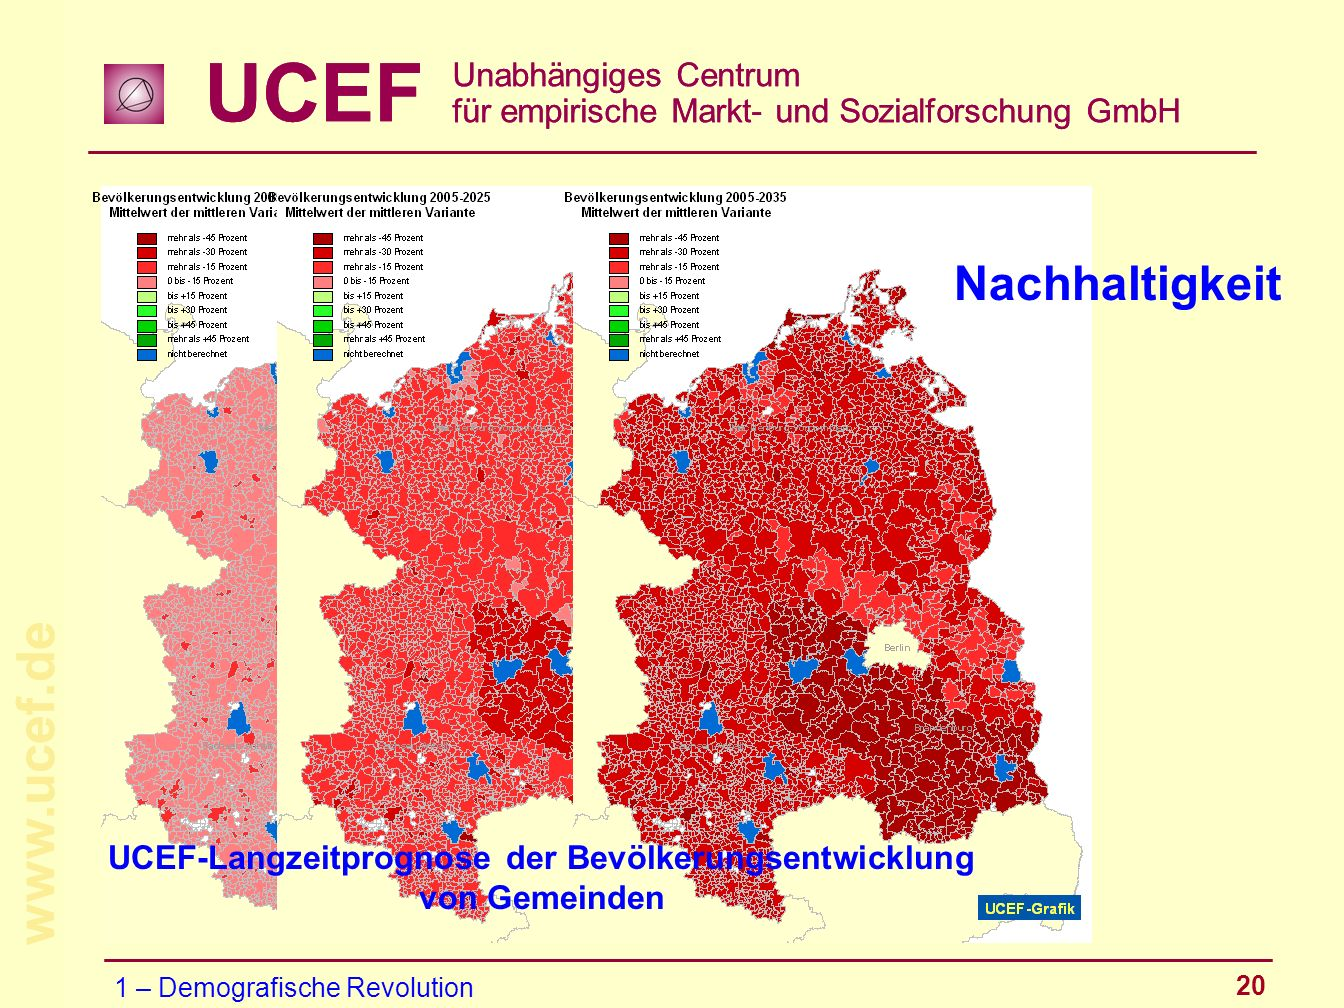 UCEF-Langzeitprognose der Bevölkerungsentwicklung